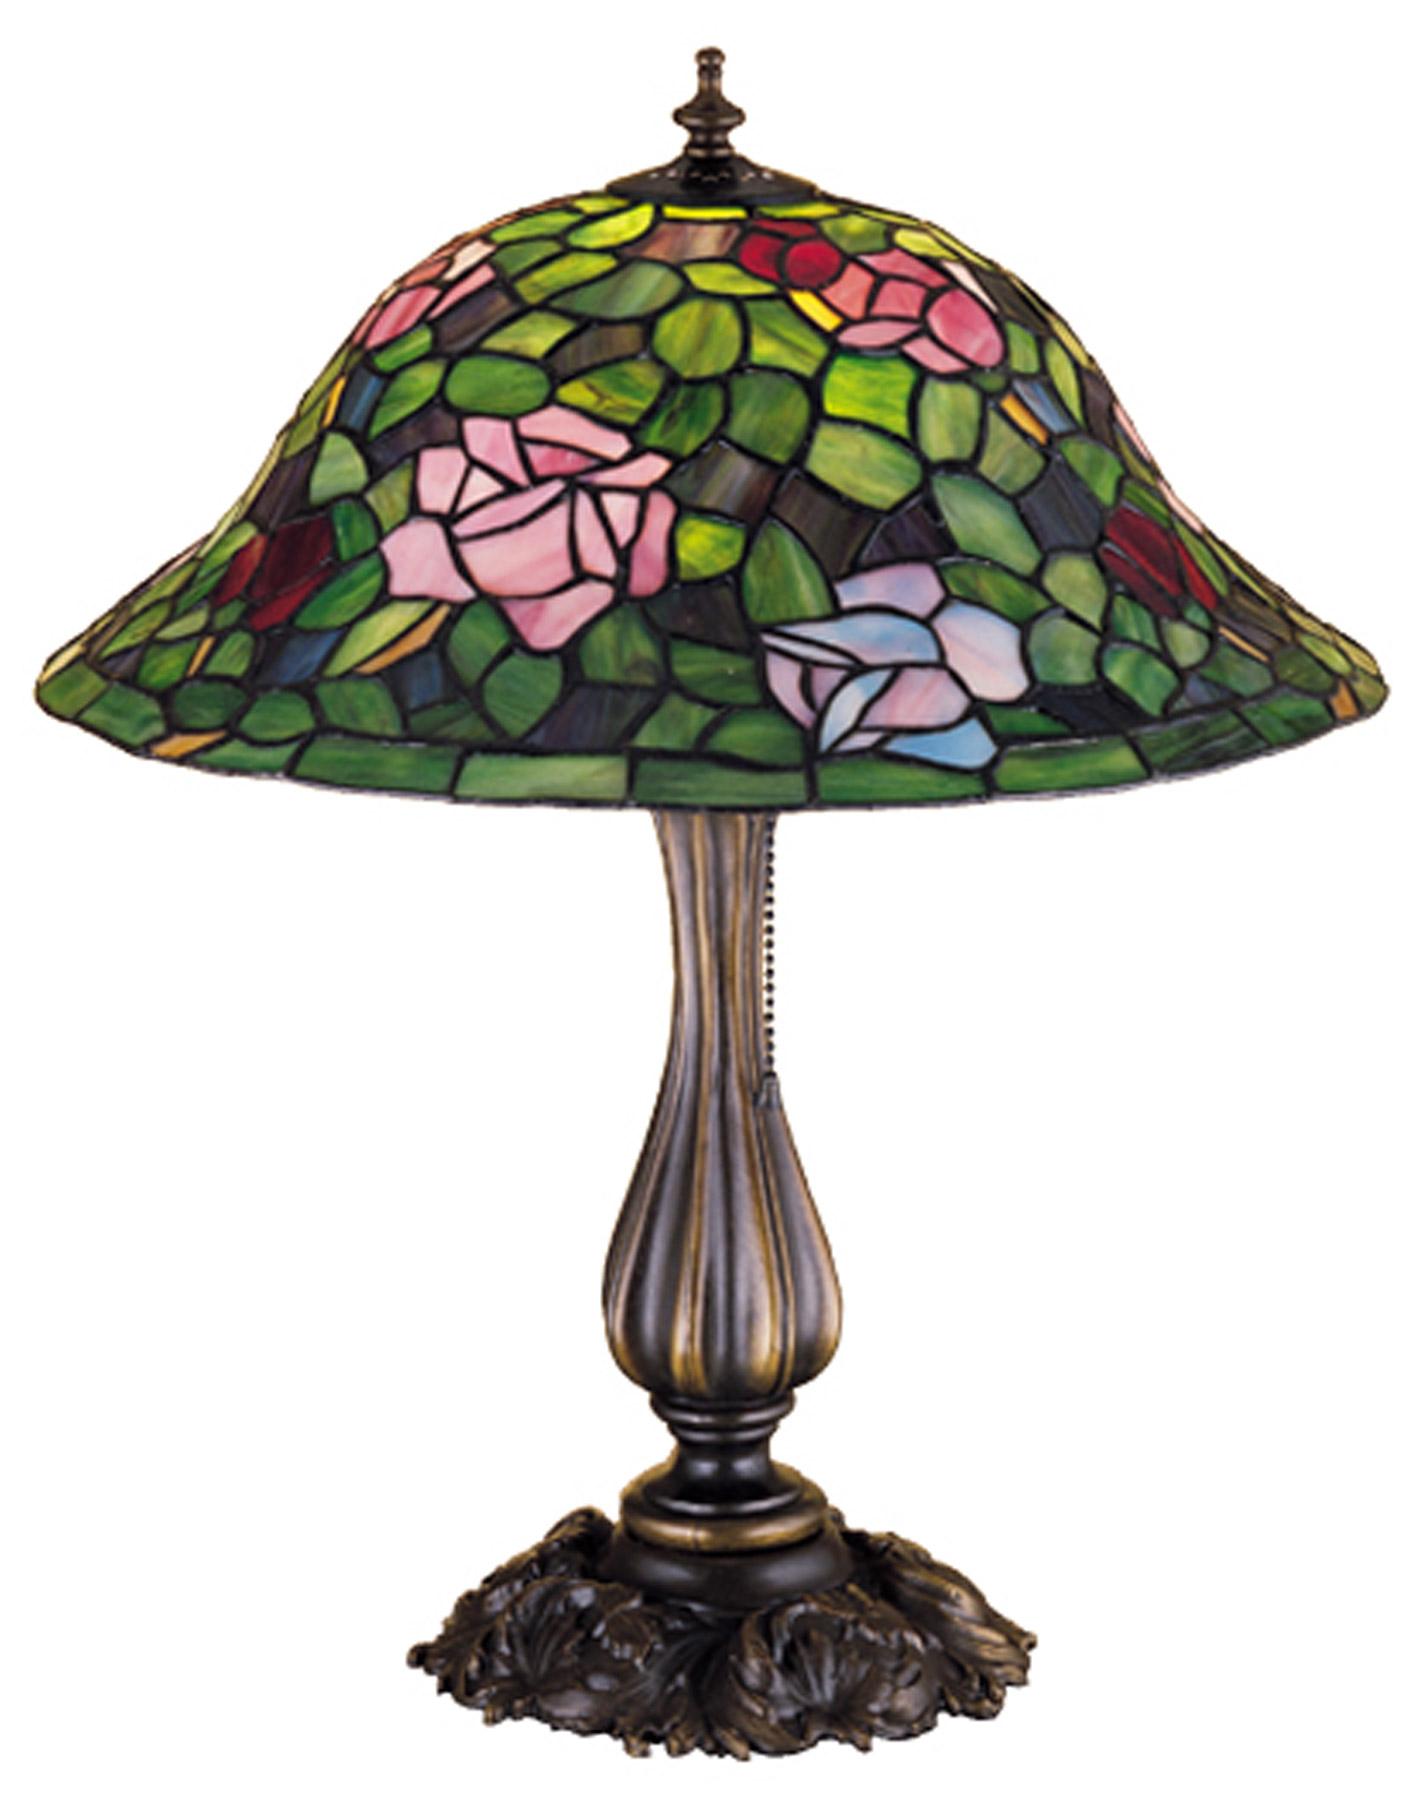 meyda 26489 tiffany rosebush table lamp. Black Bedroom Furniture Sets. Home Design Ideas